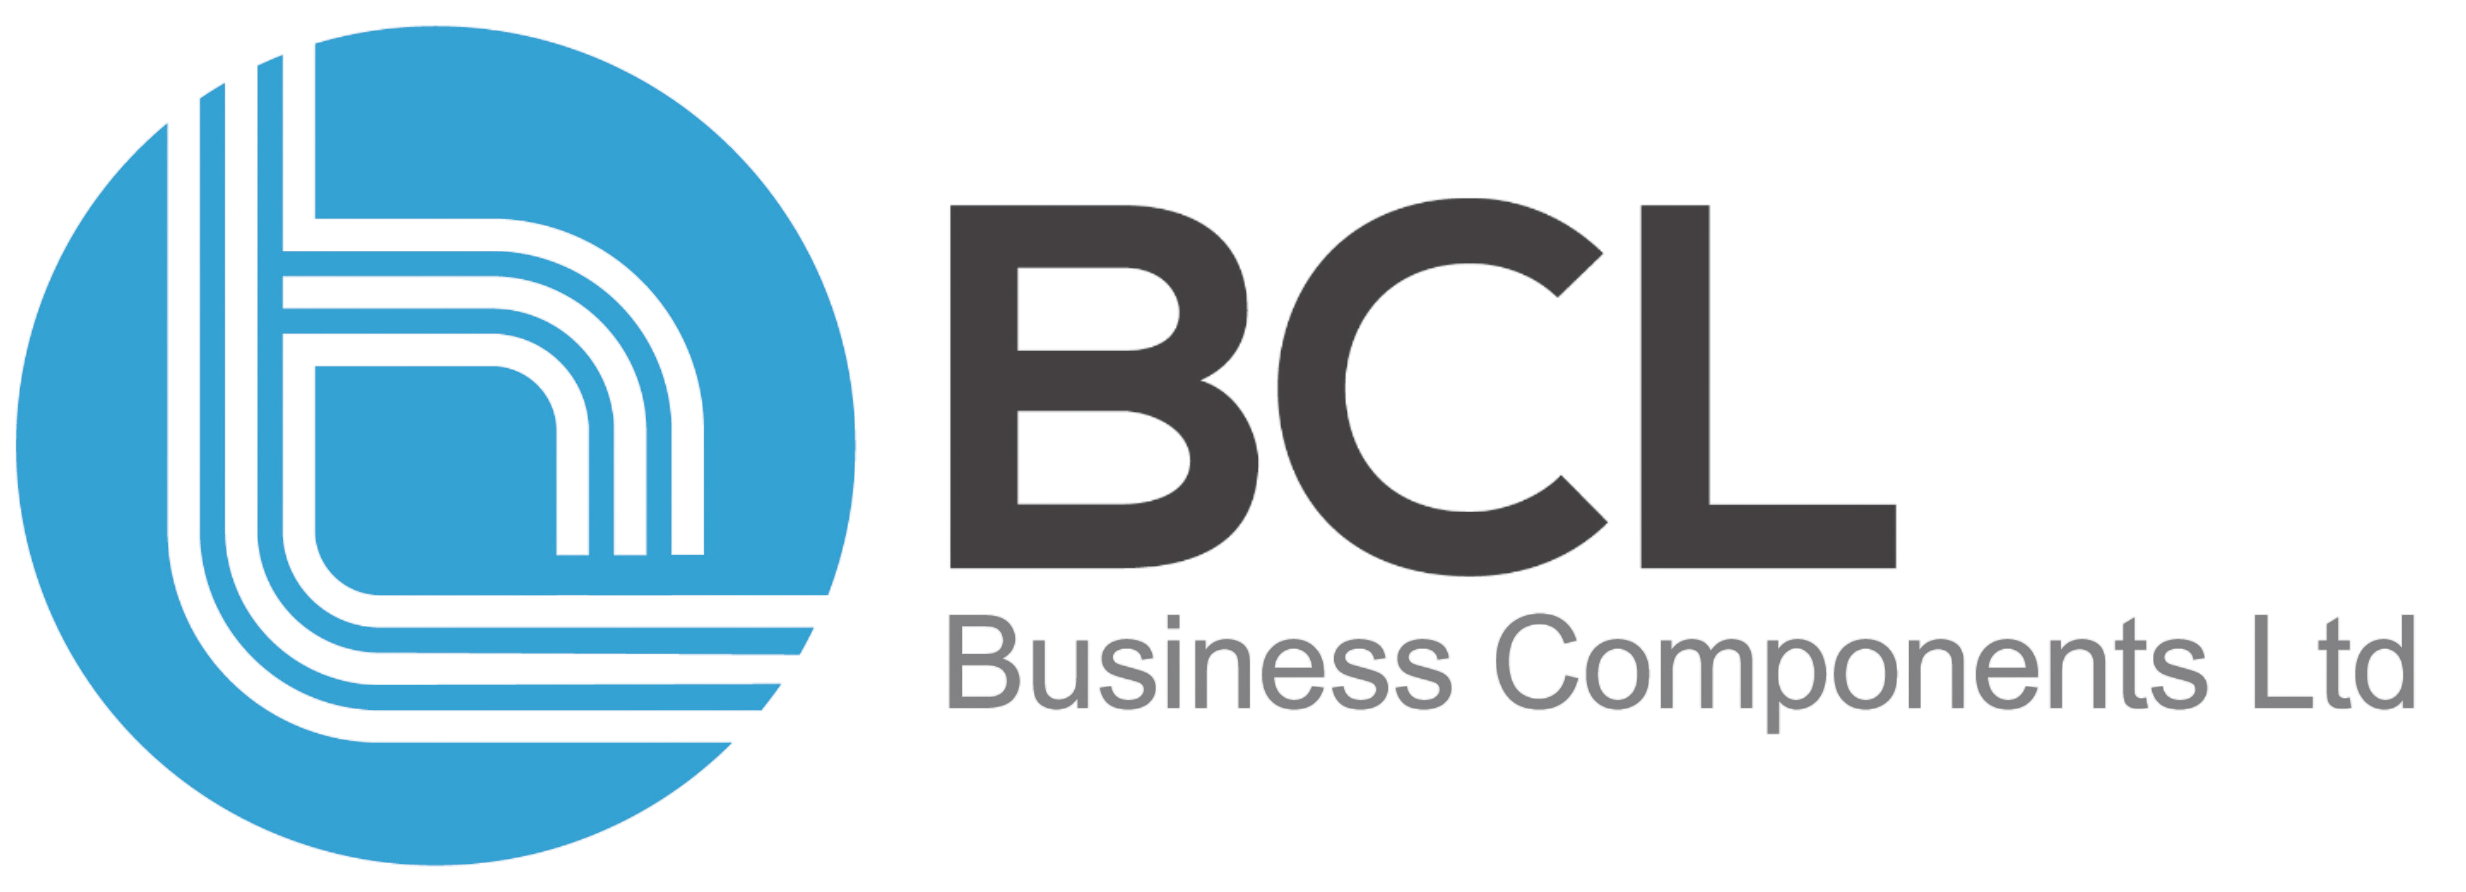 Business Components Ltd